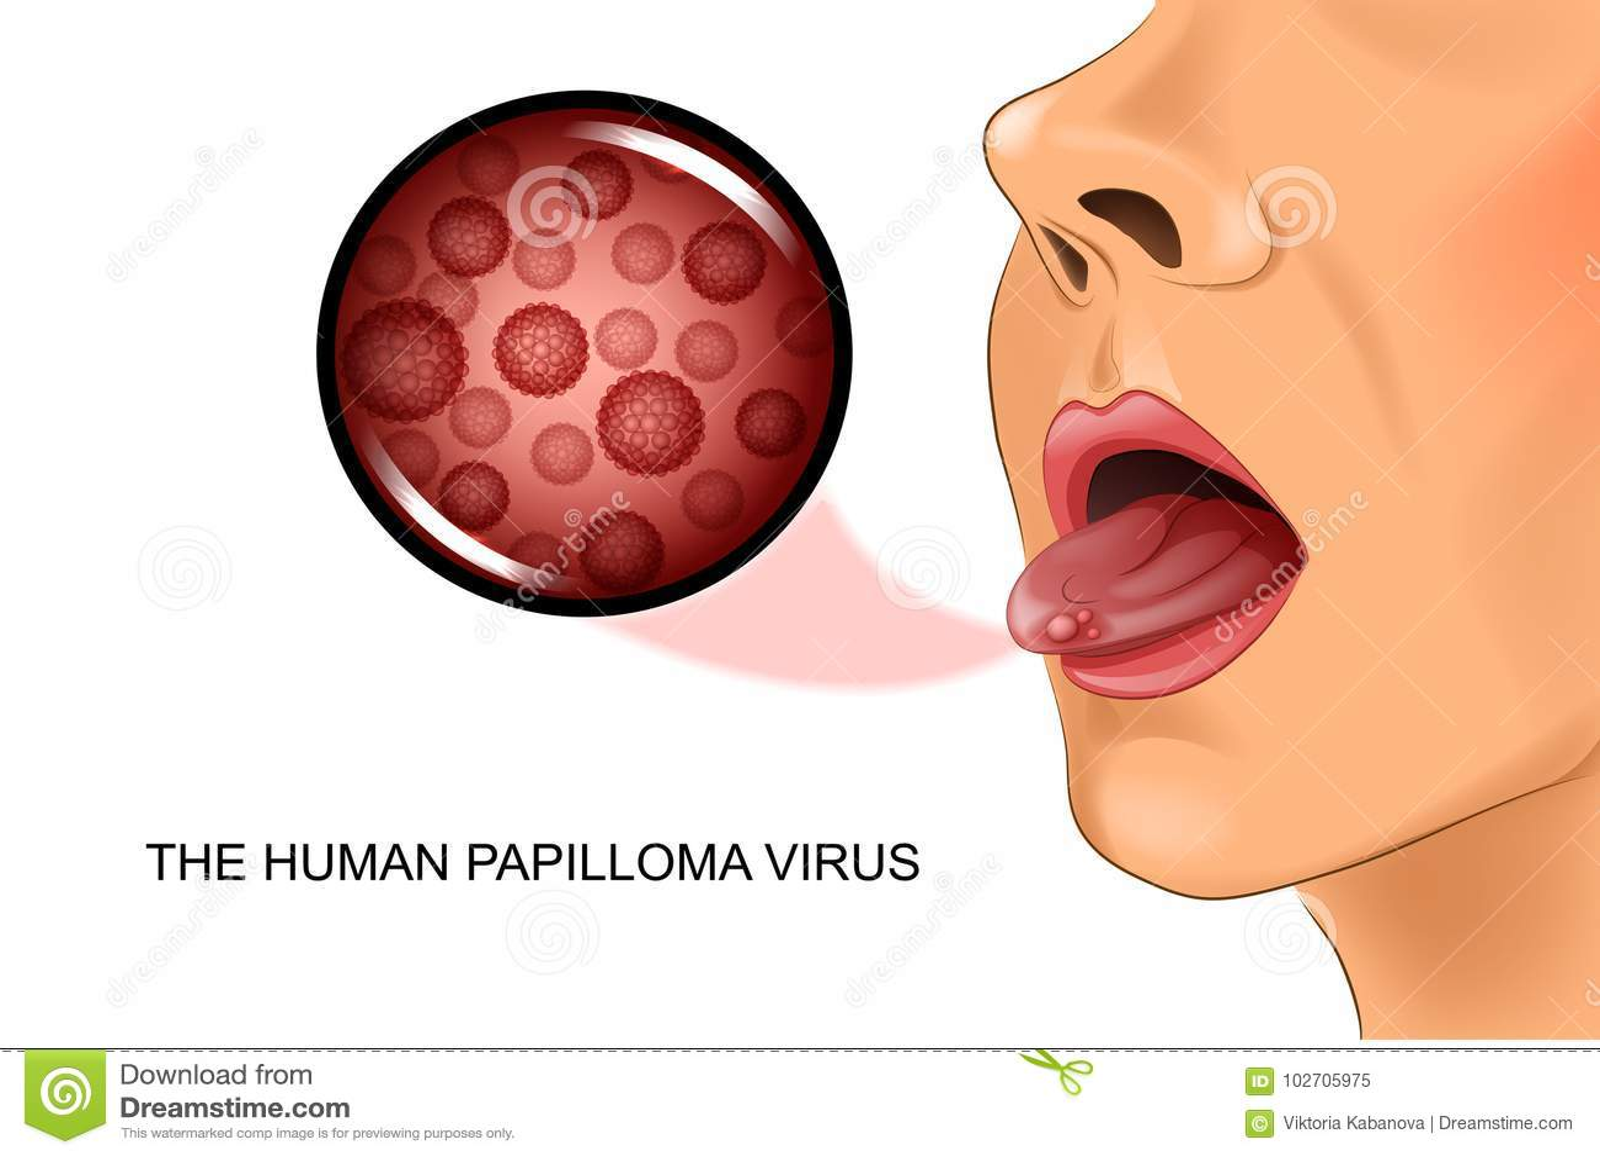 Papillomavirus genital humain - Papillomavirus humain genitaux